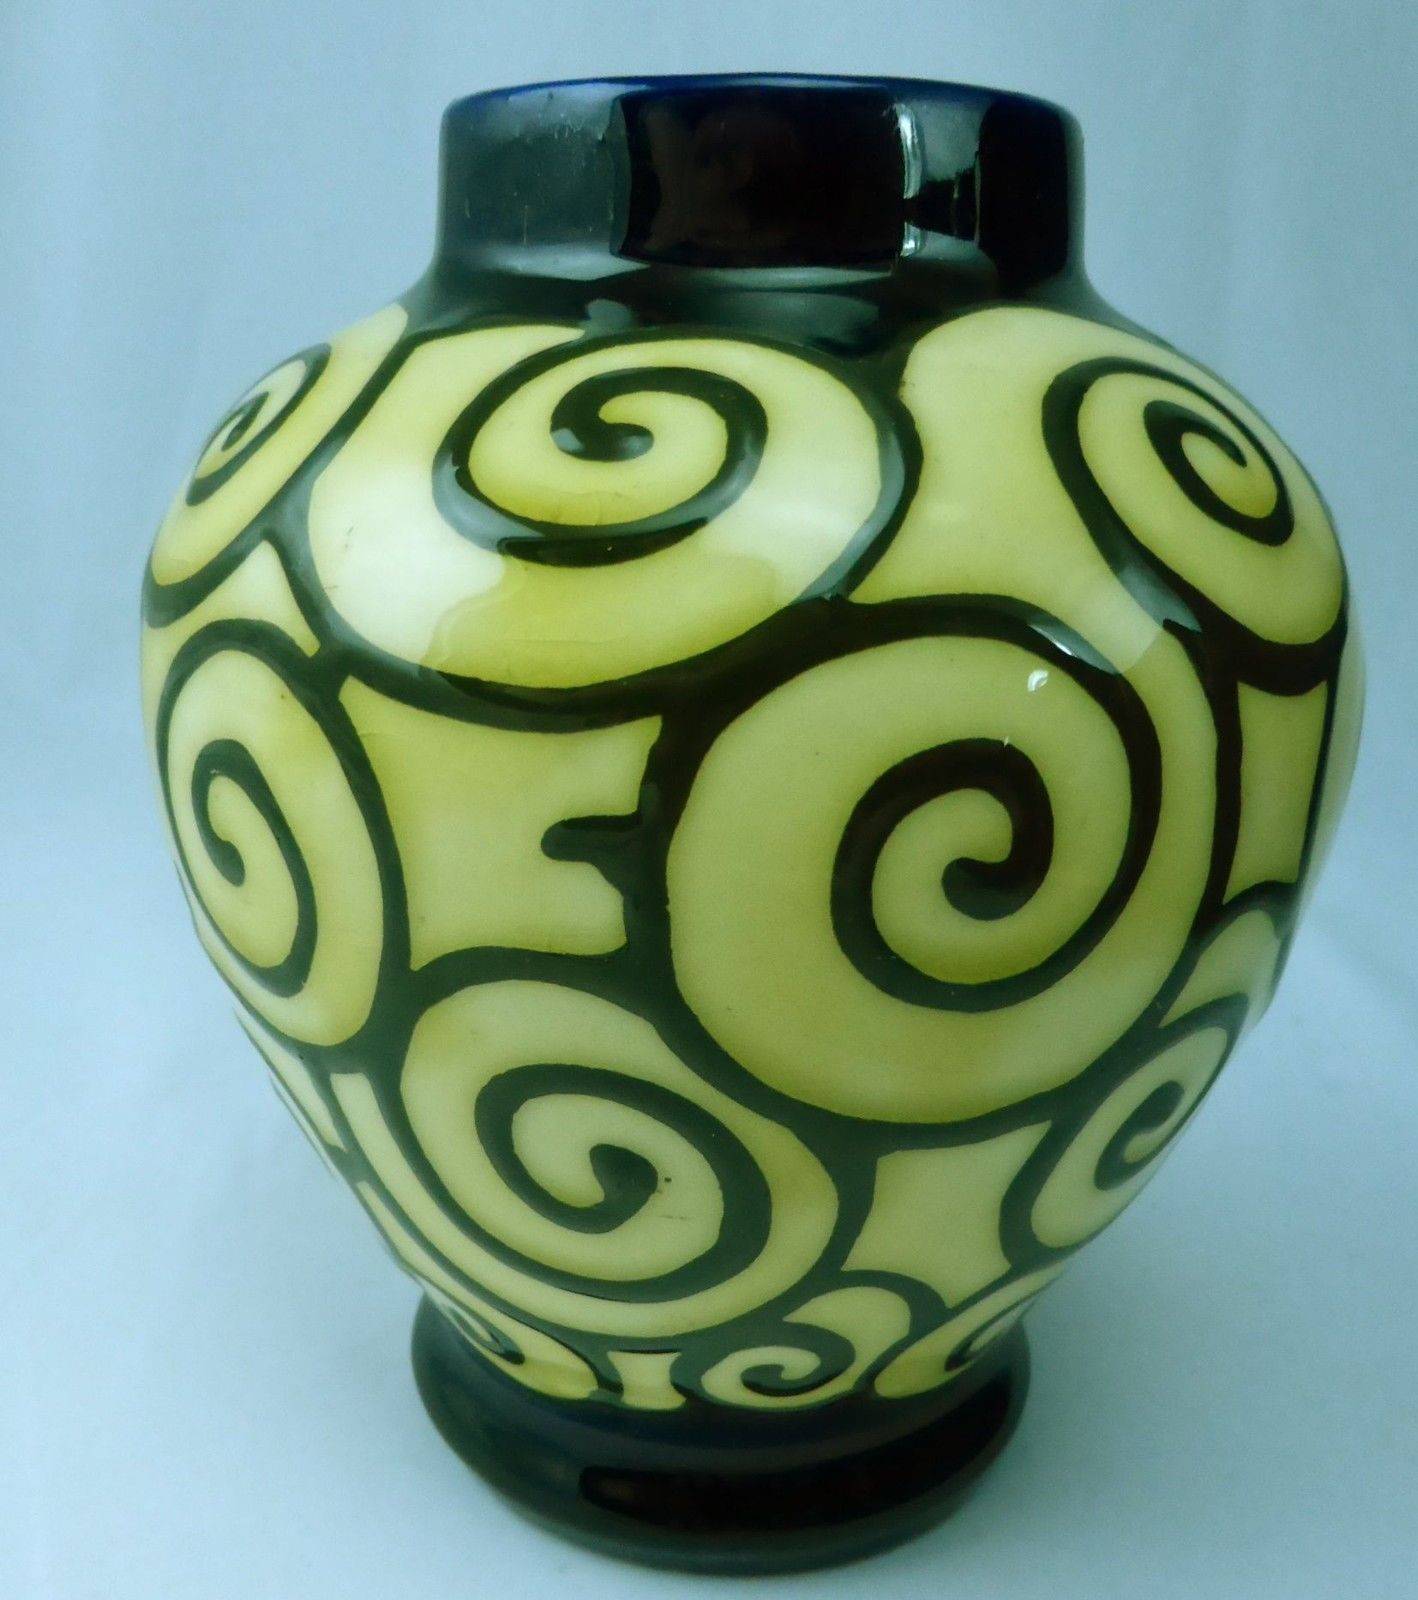 czech art glass vase of ditmar urbach czech pottery www topsimages com with rare ditmar urbach czech art deco vase blue slip glaze with multicolor swirls jpg 1418x1600 ditmar